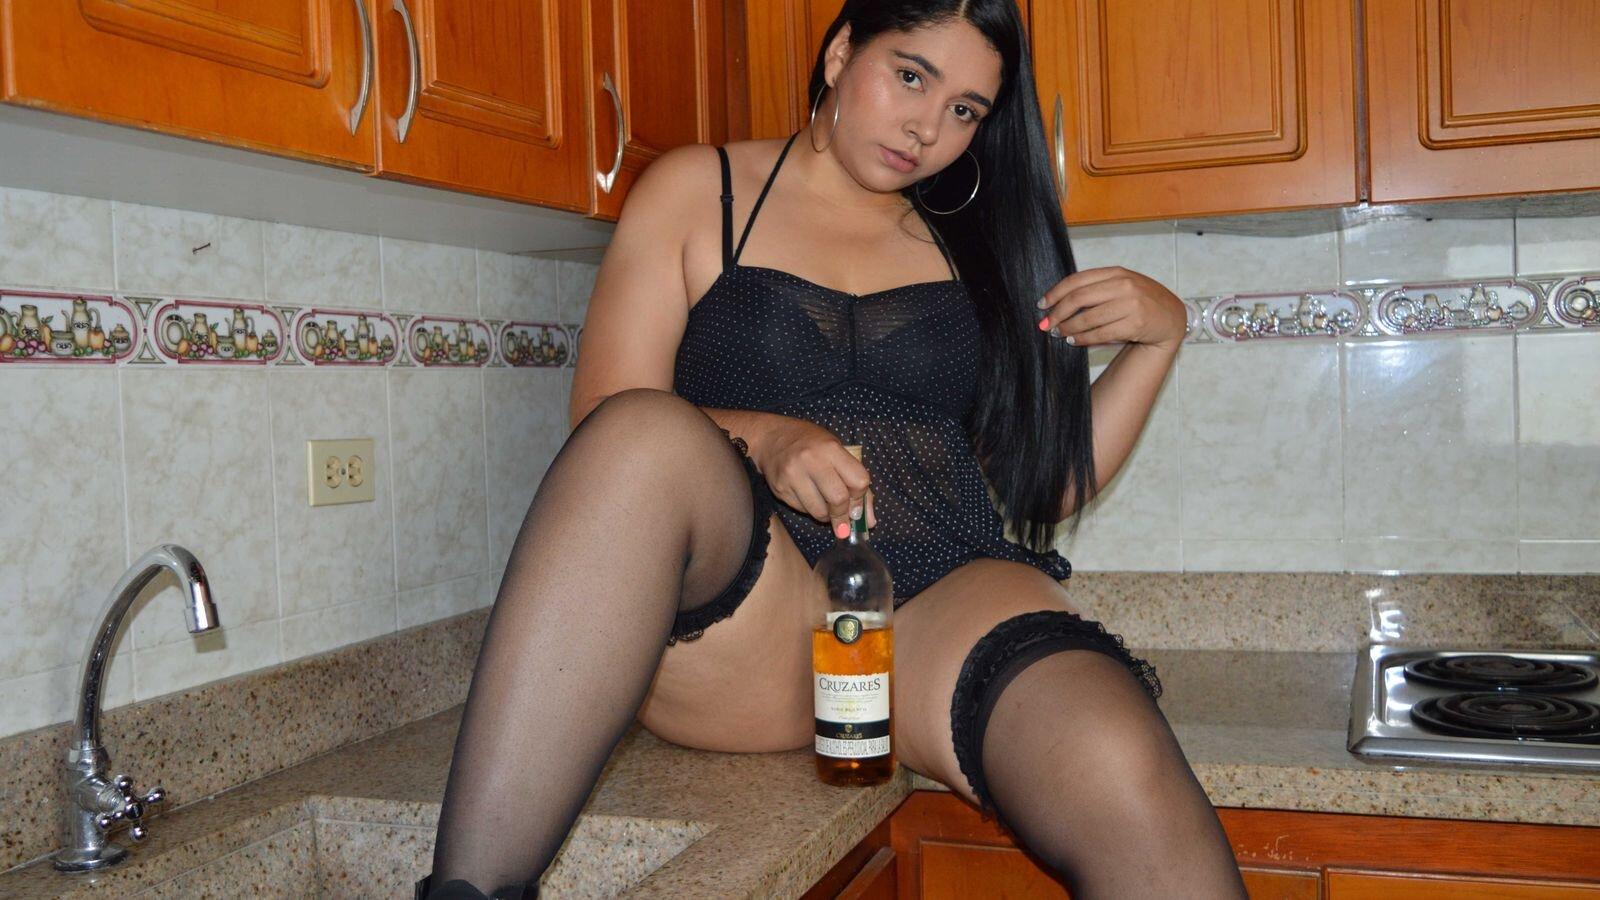 NatashaBigAs